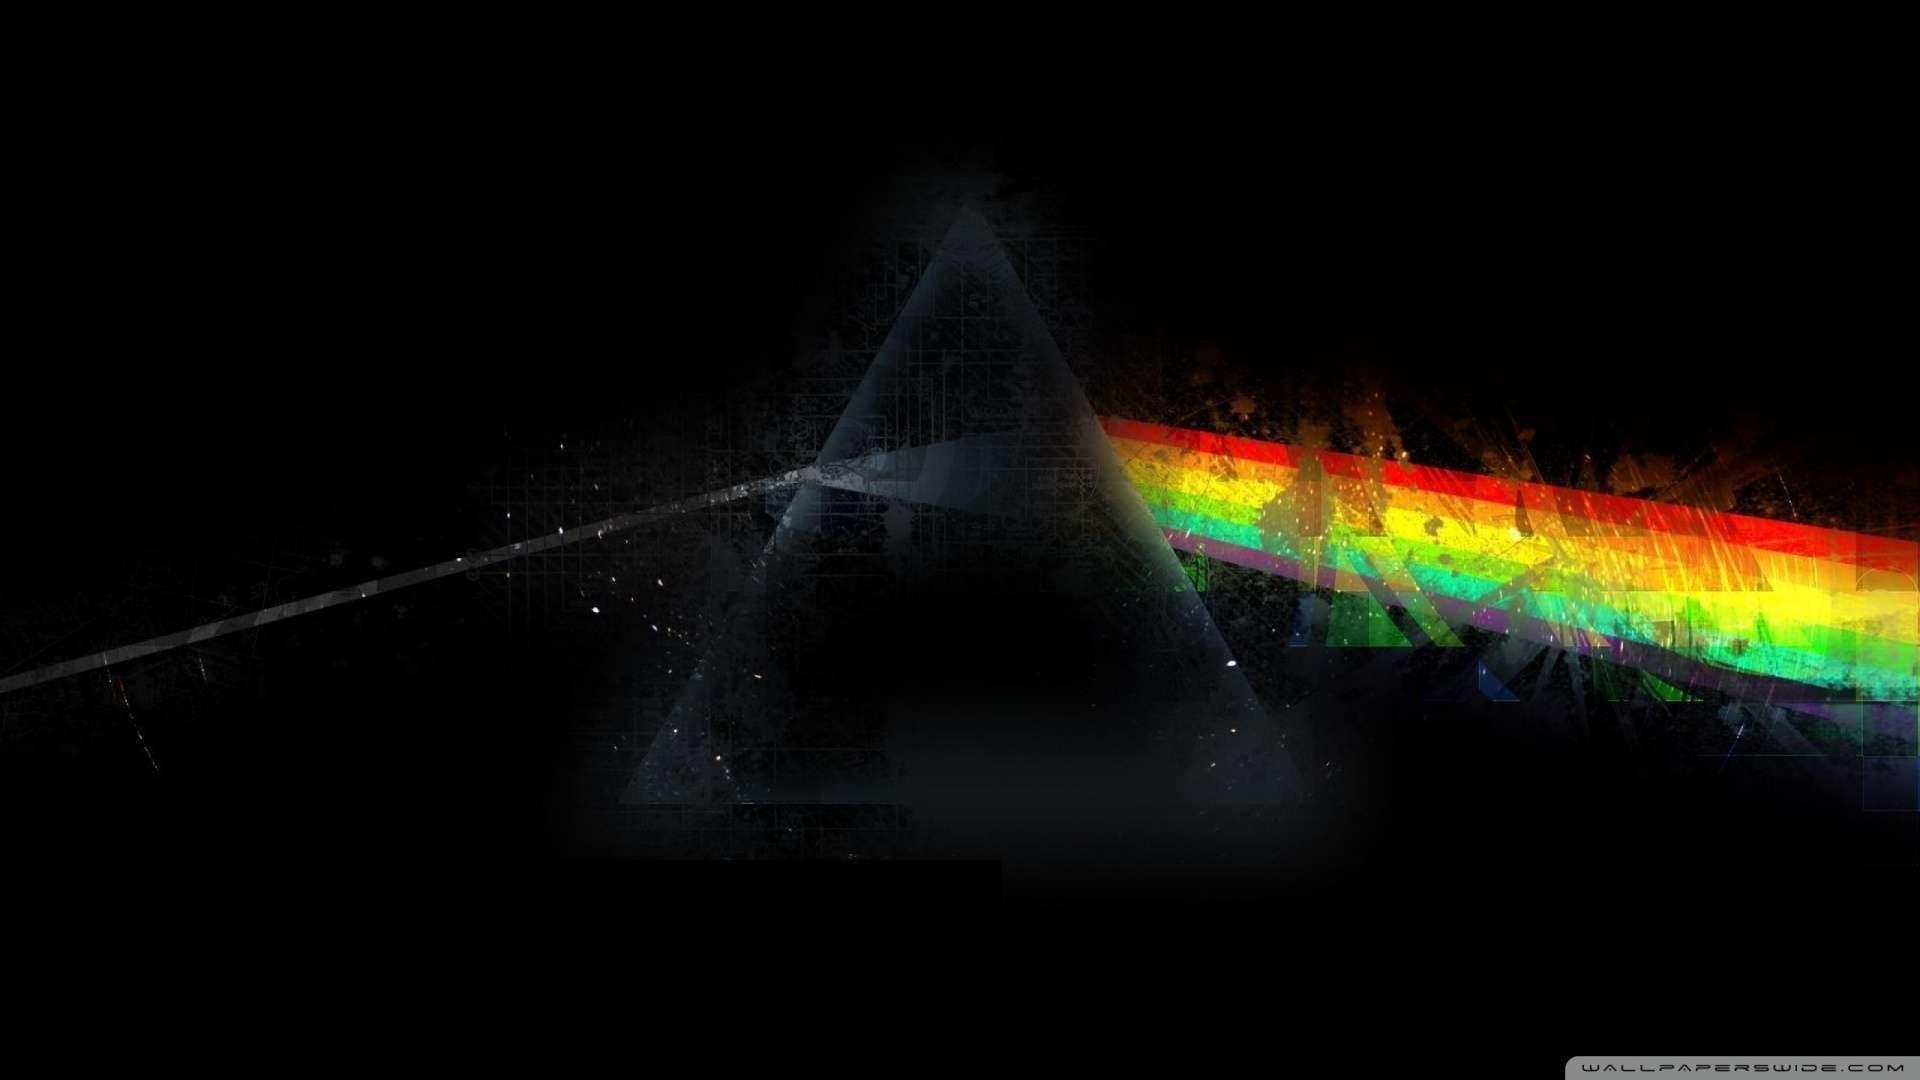 Download Pink Floyd Dispersion 2 Wallpaper 1080p HD | HDWallWide.com